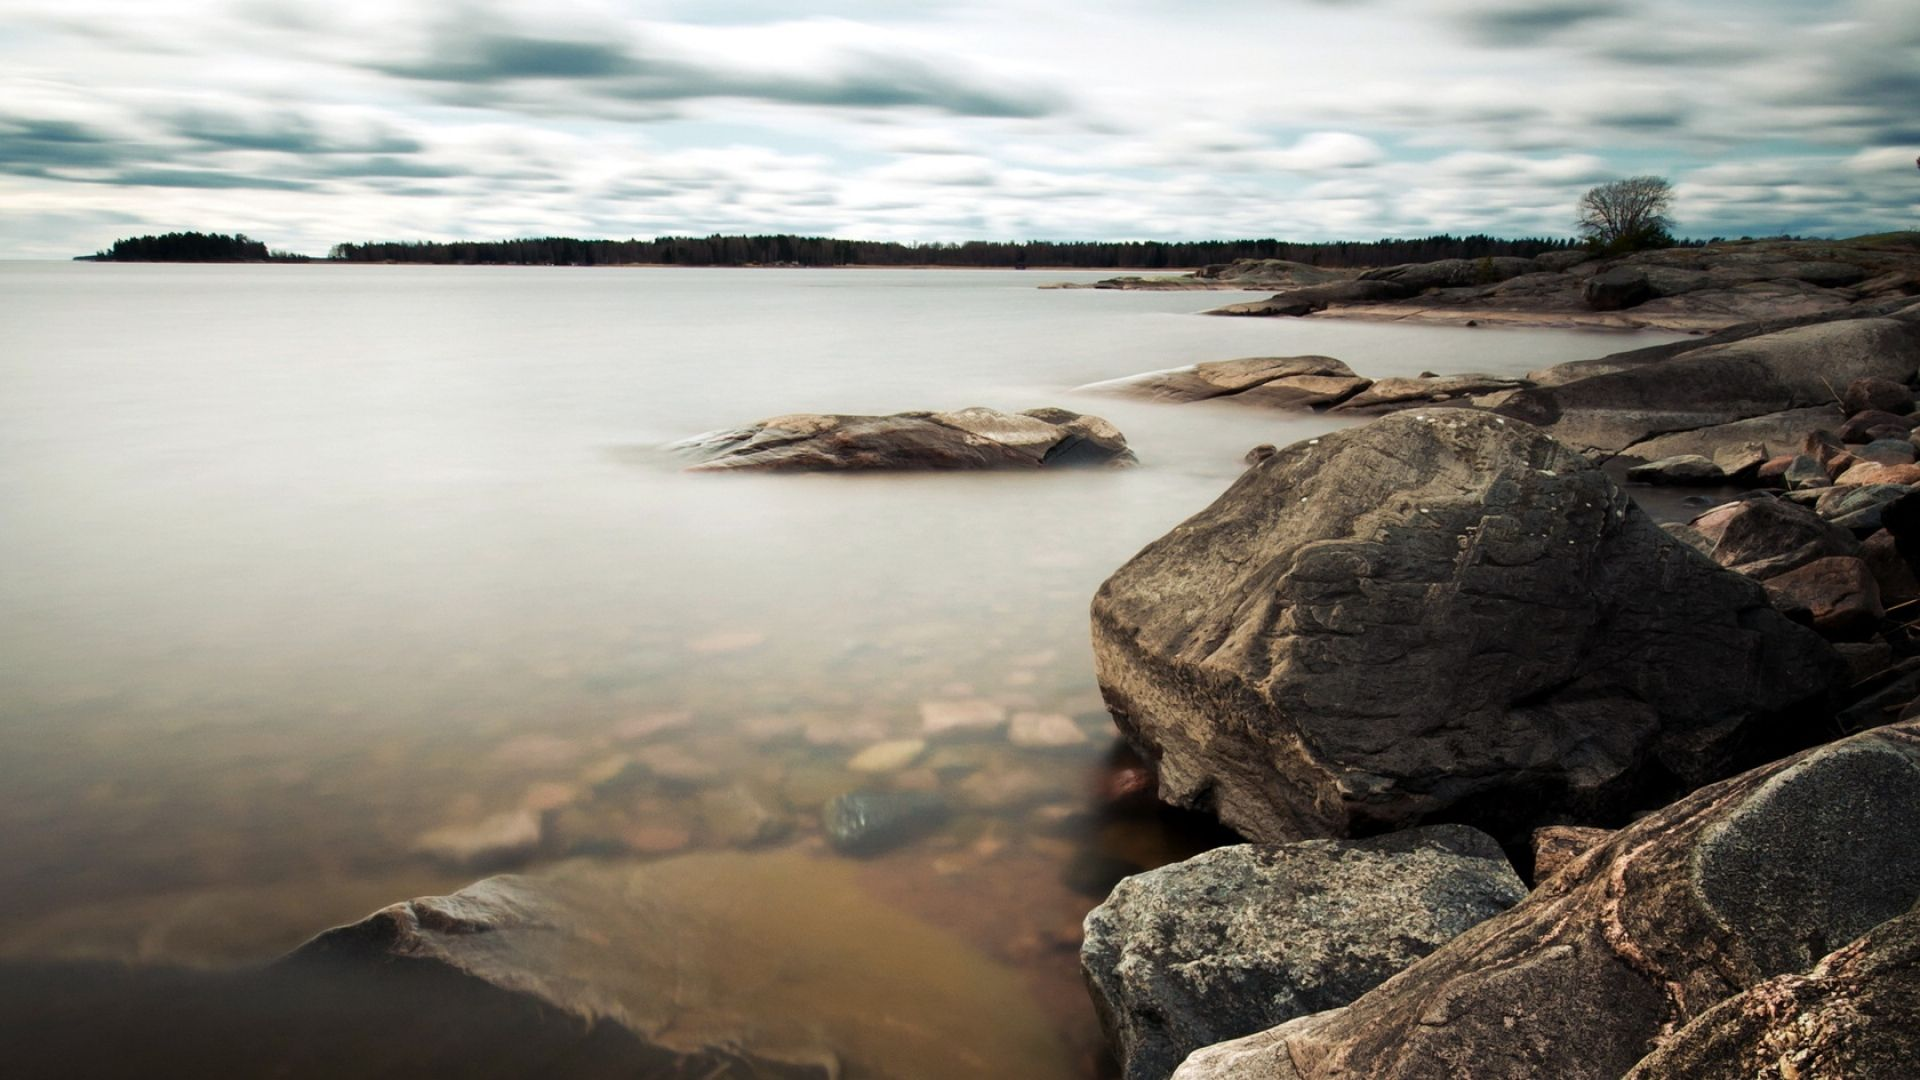 Download Wallpaper 1920x1080 Stones Lake Coast Emptiness Full Hd 1080p Hd Background